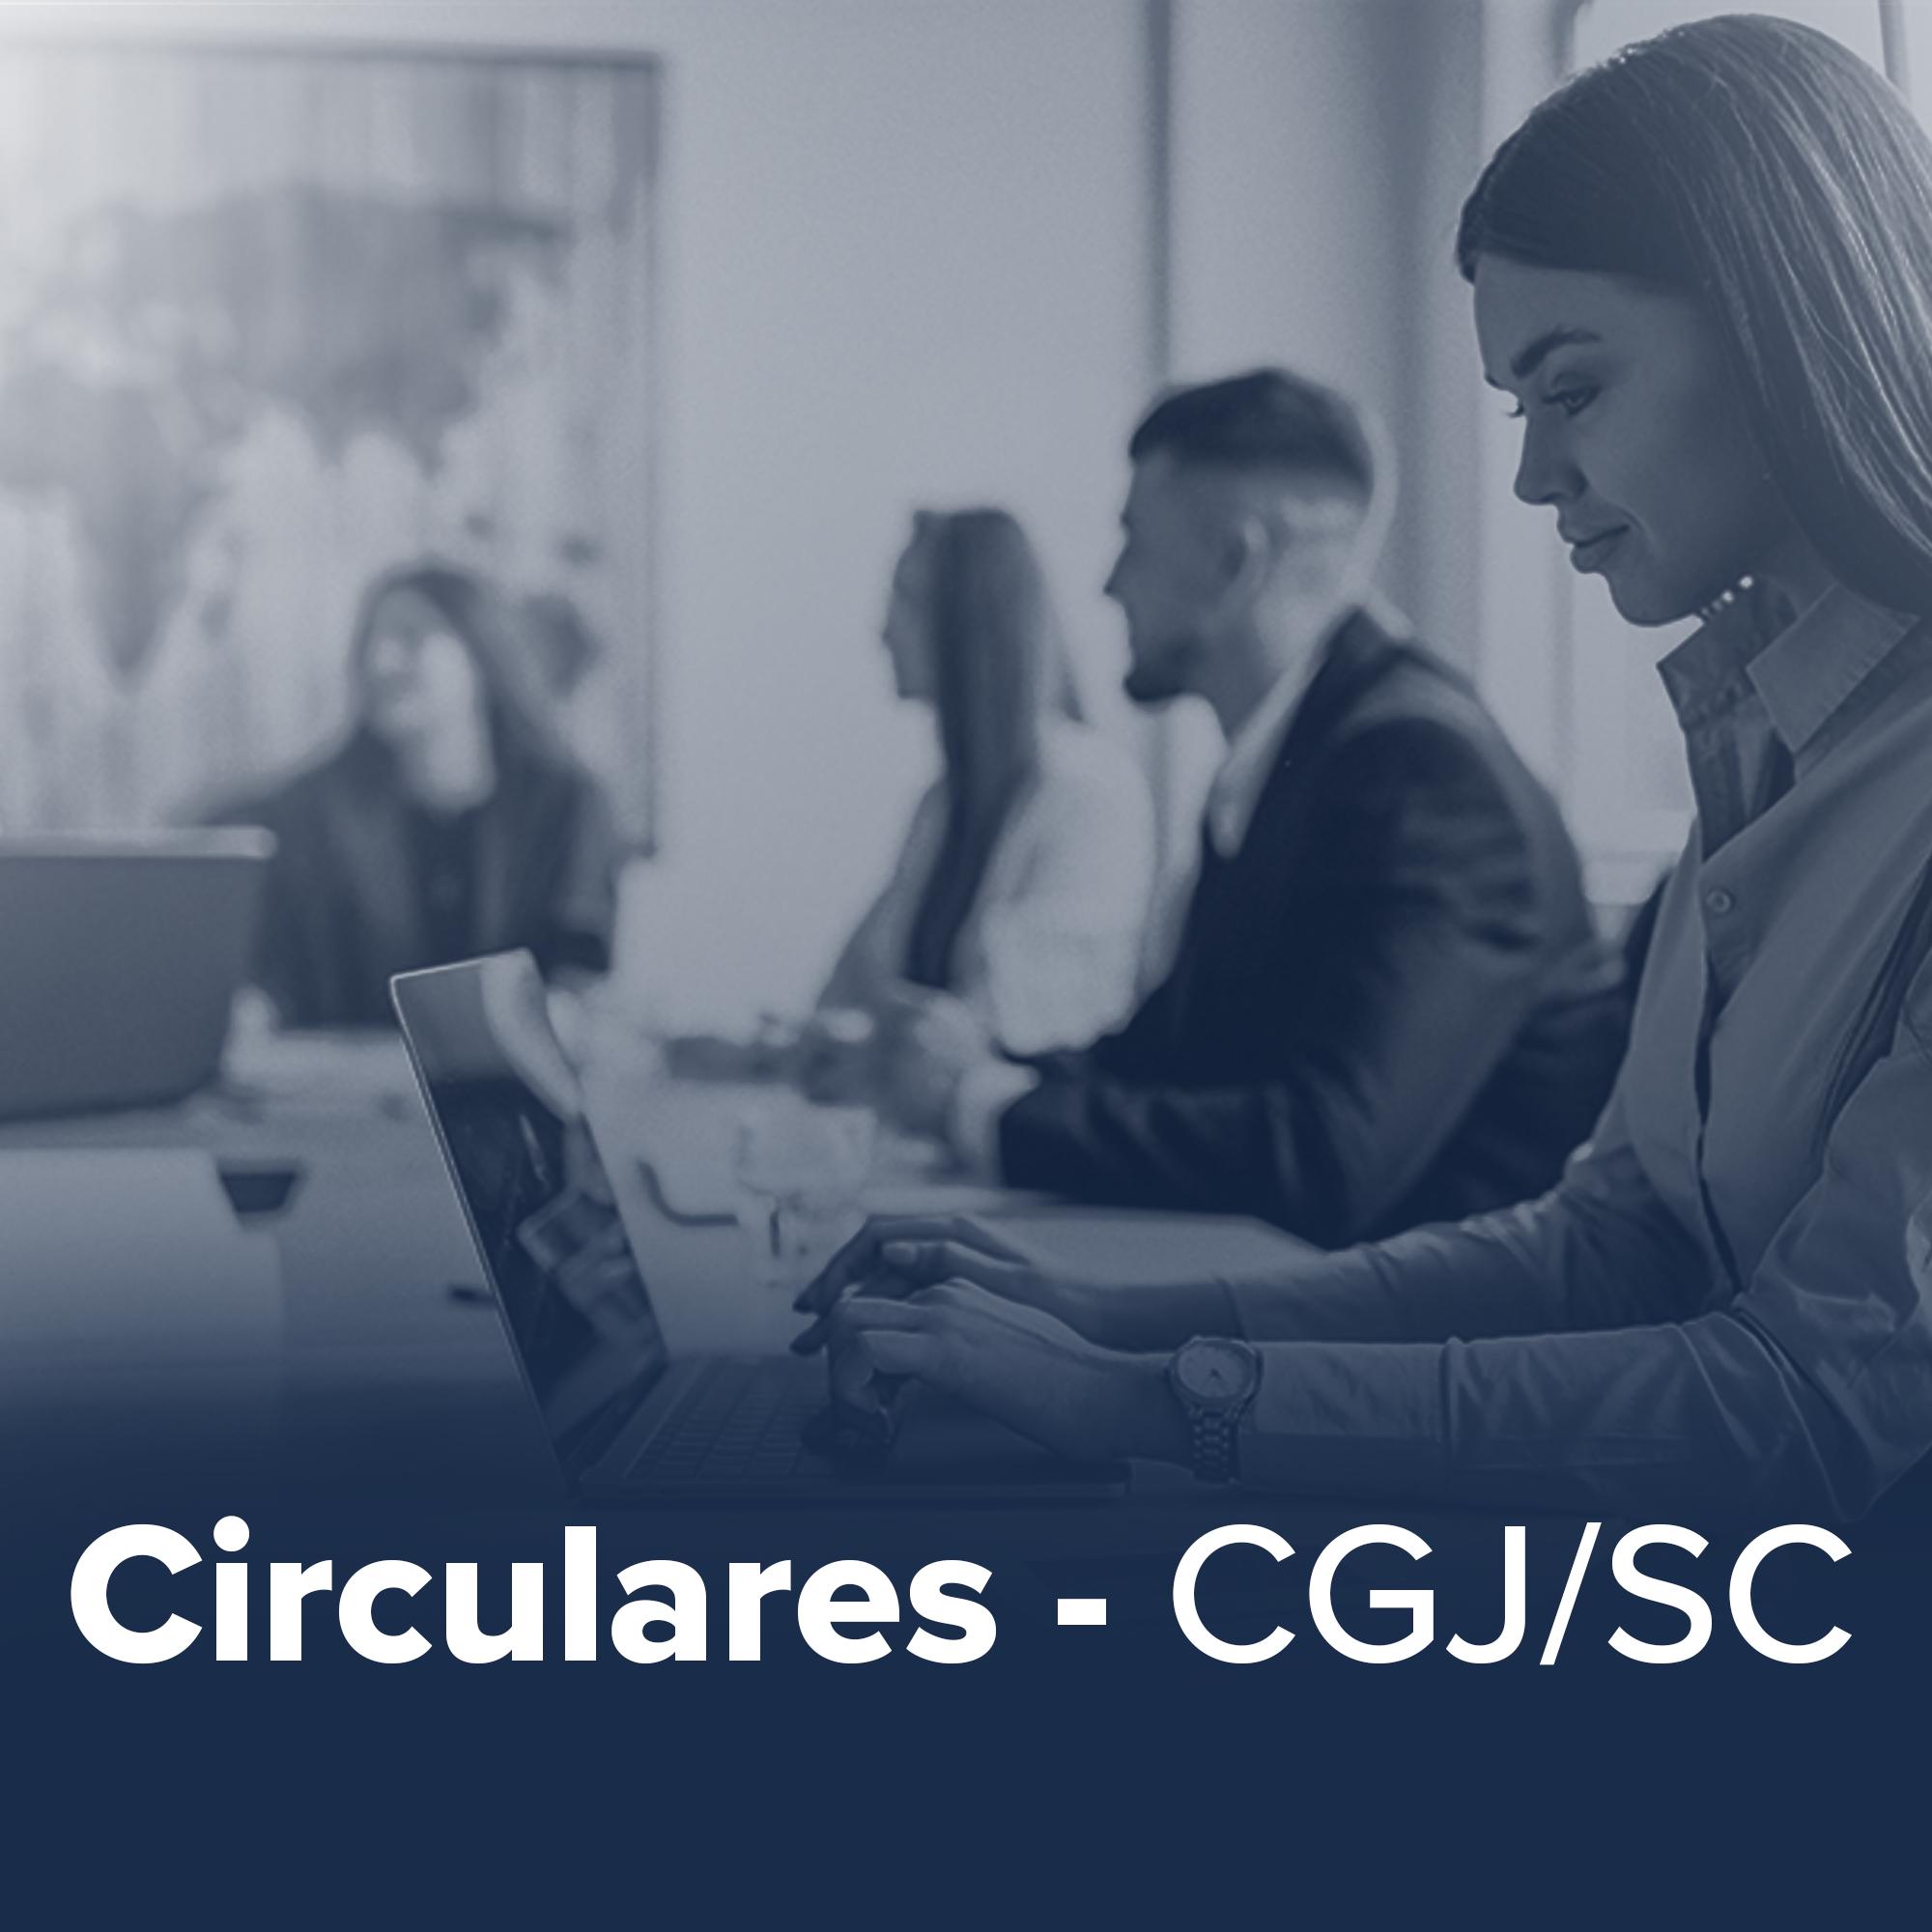 CIRCULARES MÊS DE JUNHO/2021 – CGJ/SC